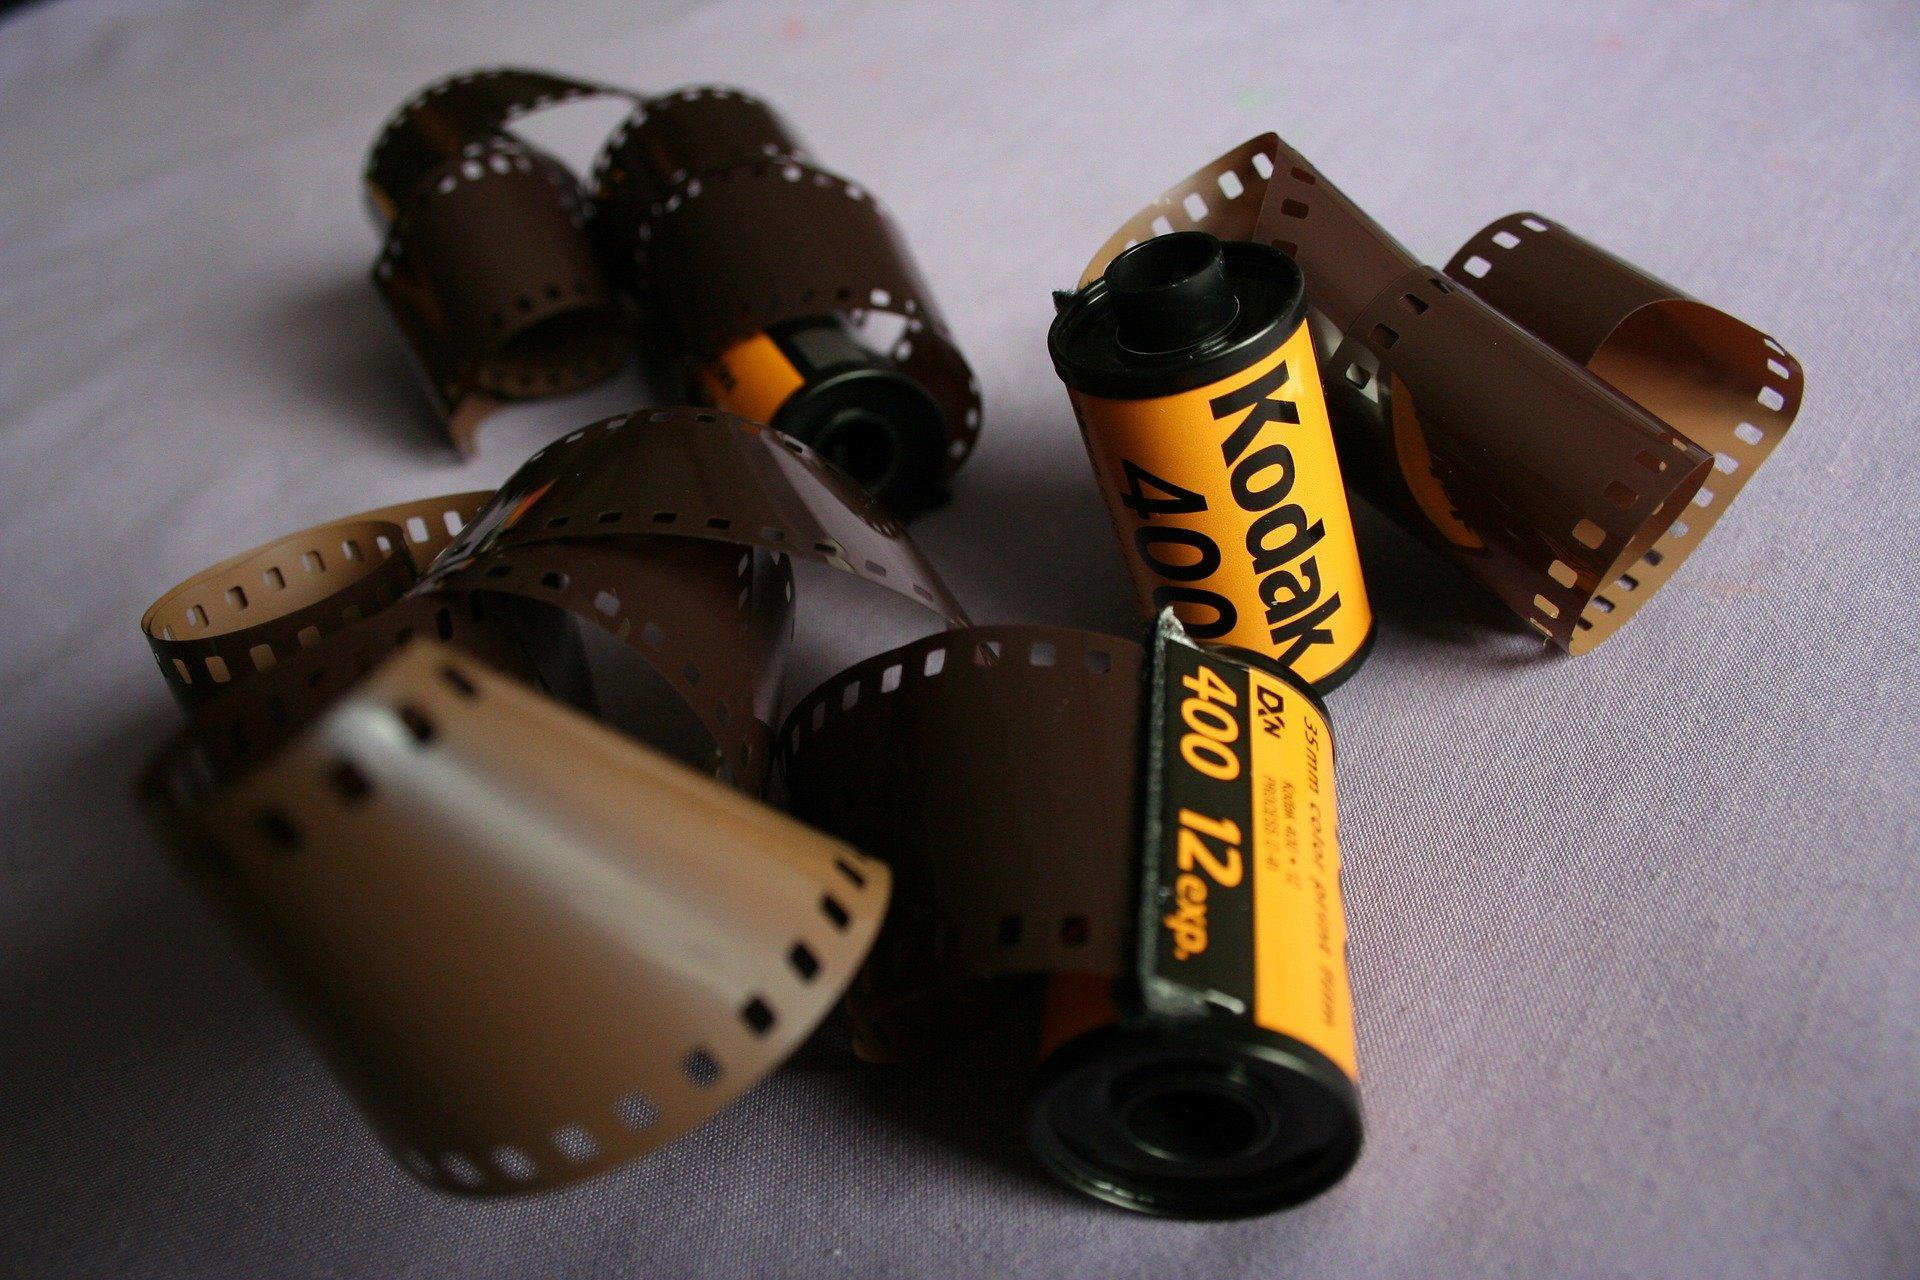 Despite Pioneering Camera Technology, Kodak Failed to Keep Up.